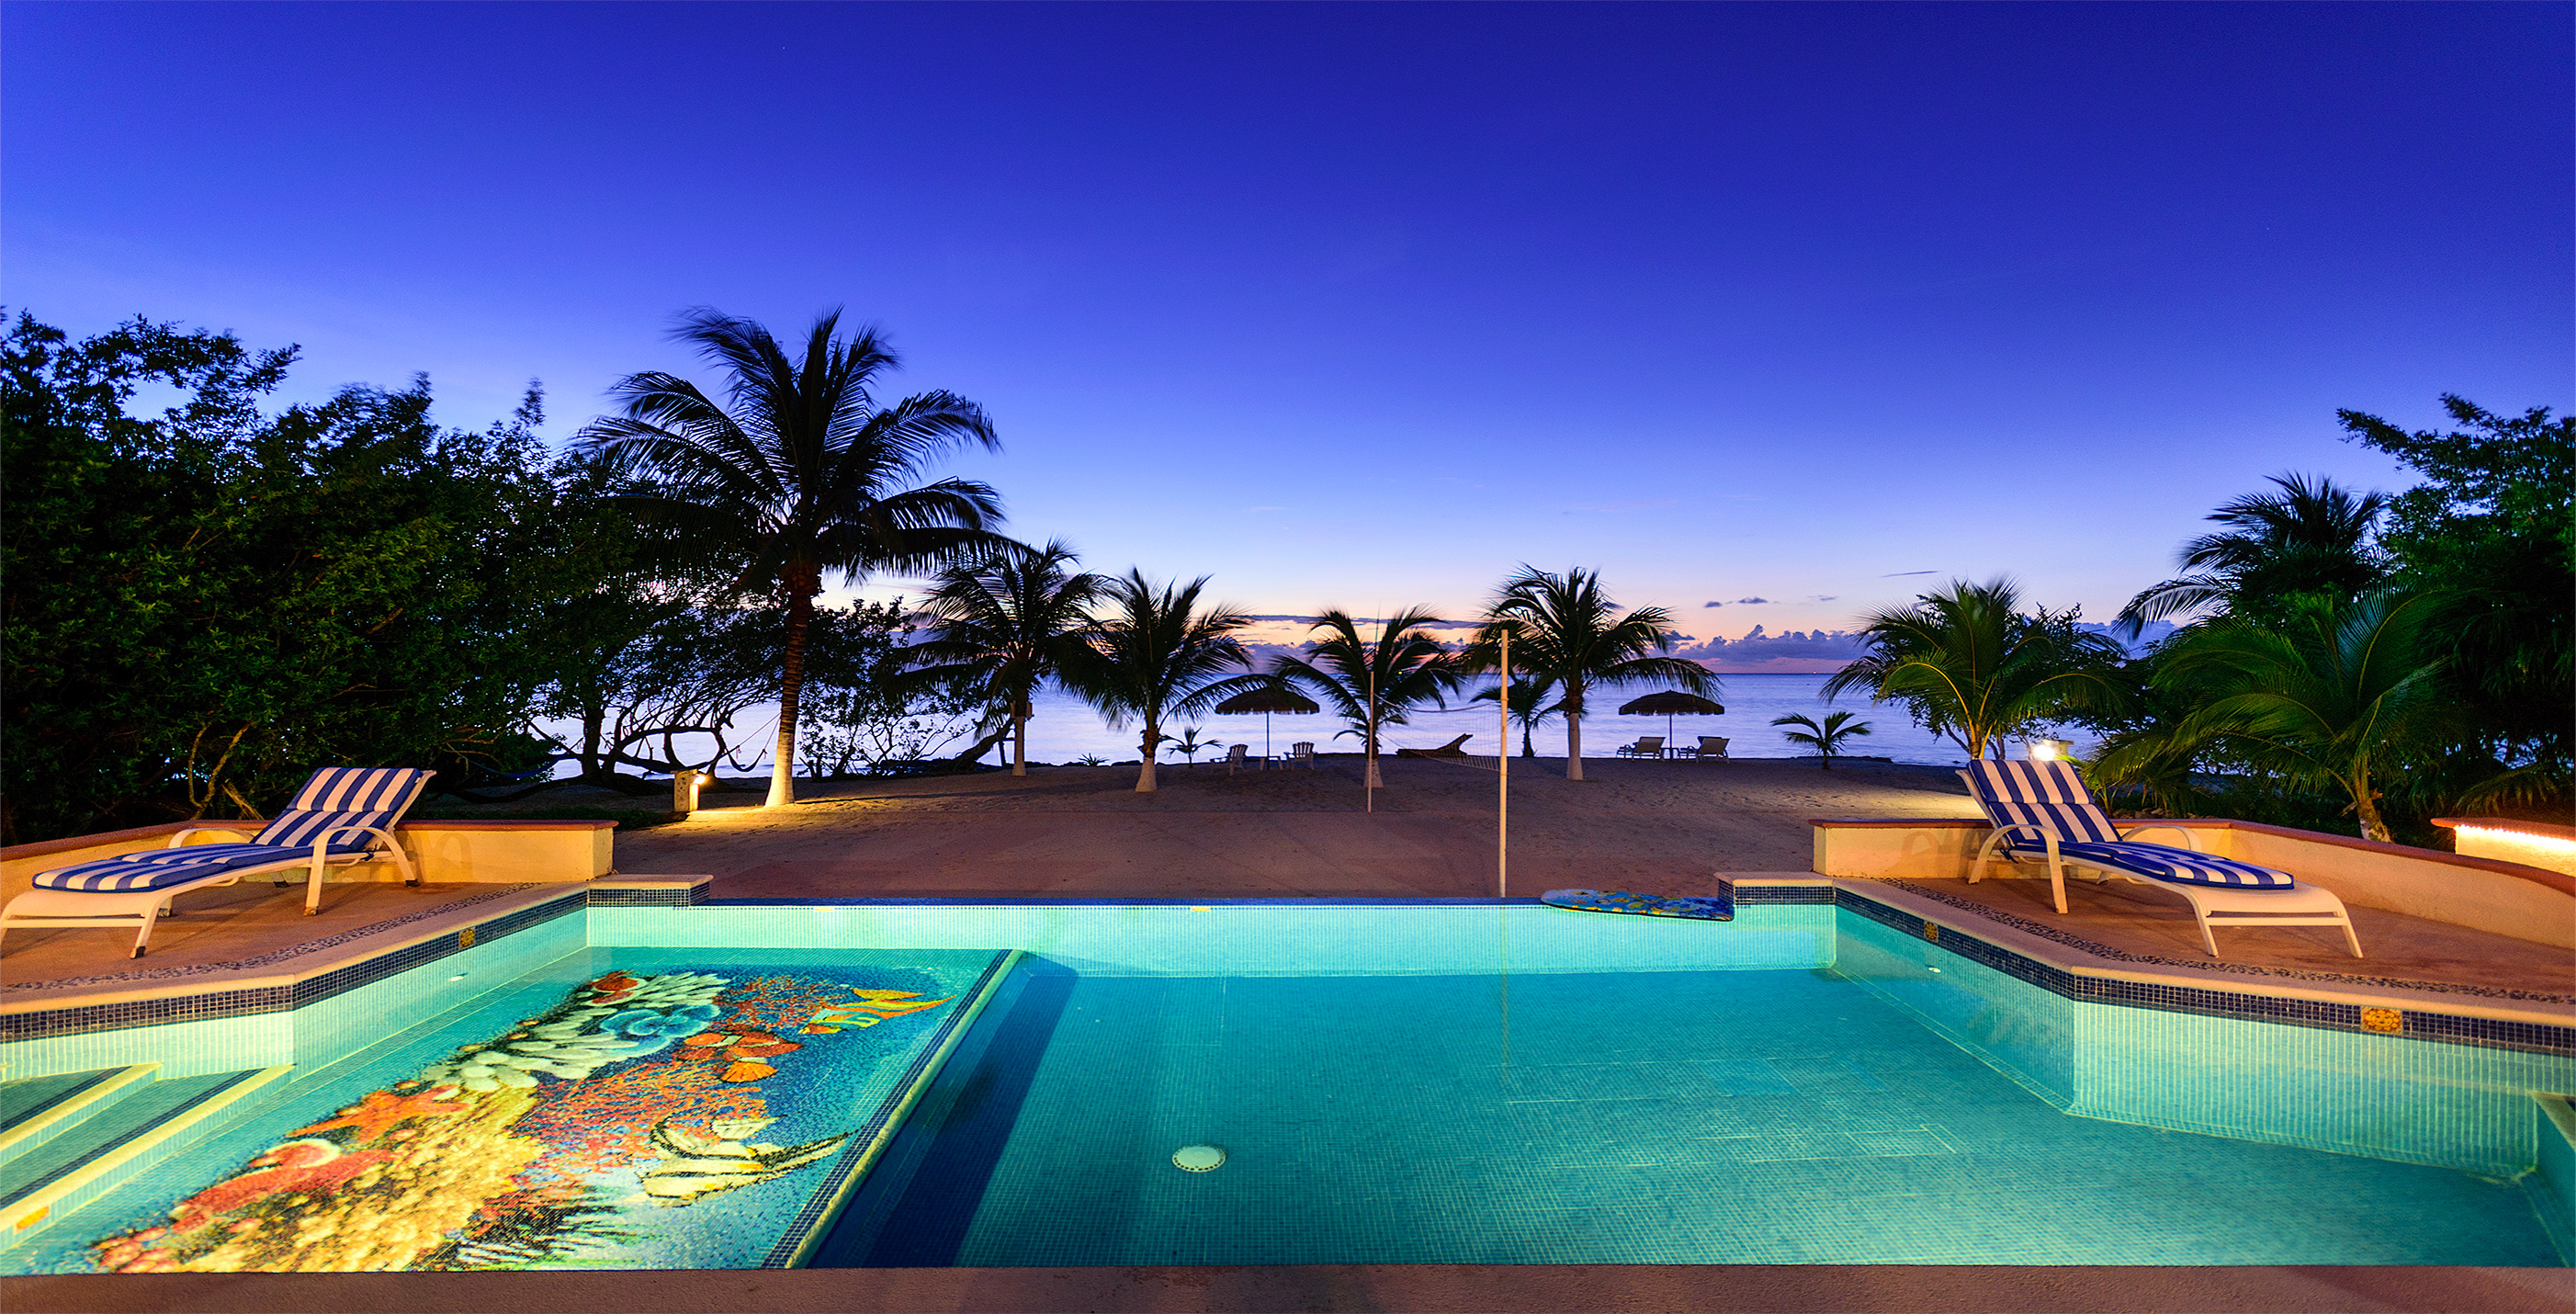 Hasil gambar untuk Vacation Condo Rentals Vs Five Star Hotels